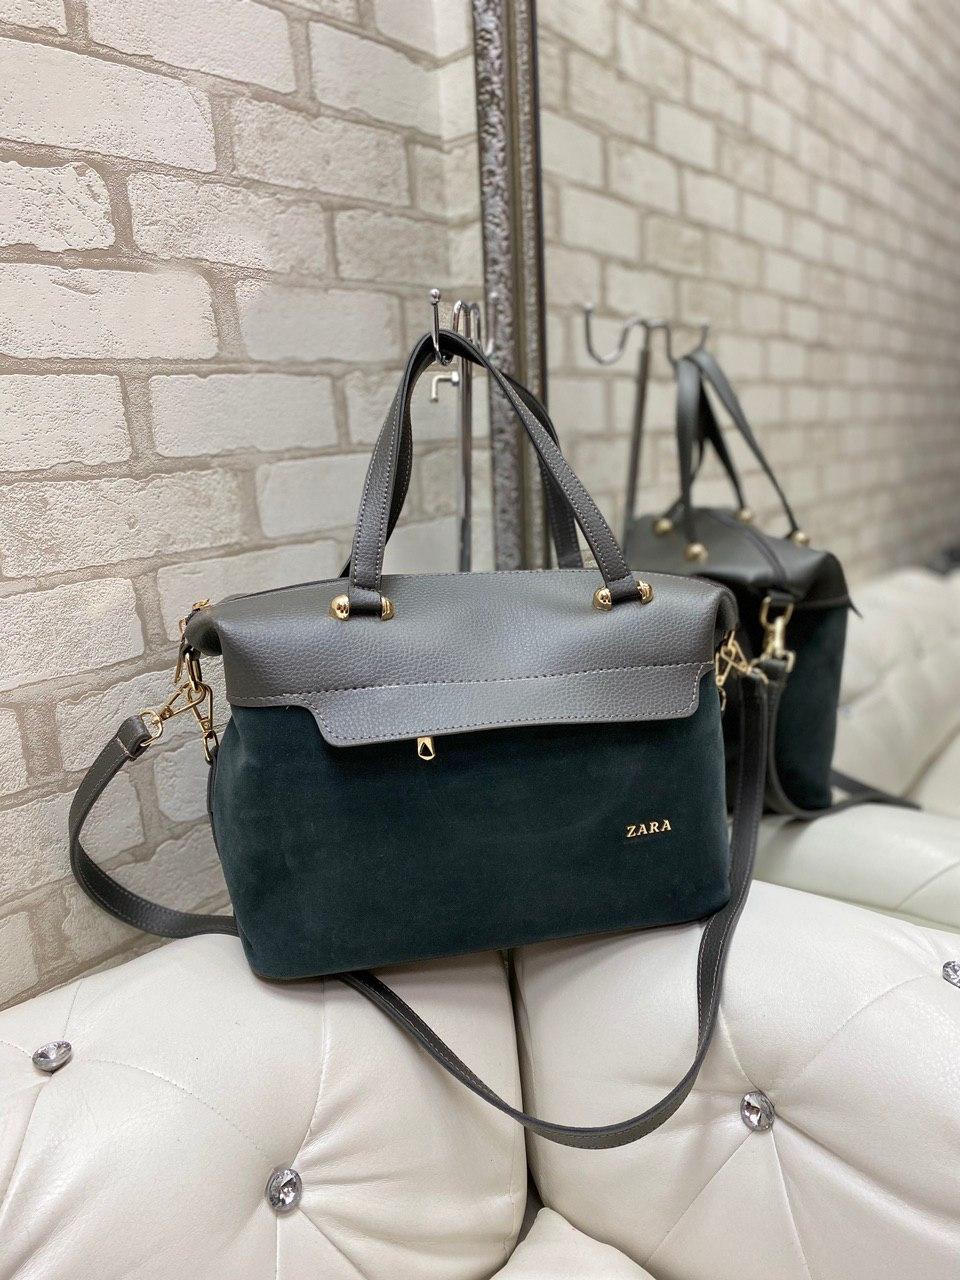 Большая замшевая женская сумка саквояж серая на плечо шоппер брендовая натуральная замша+кожзам